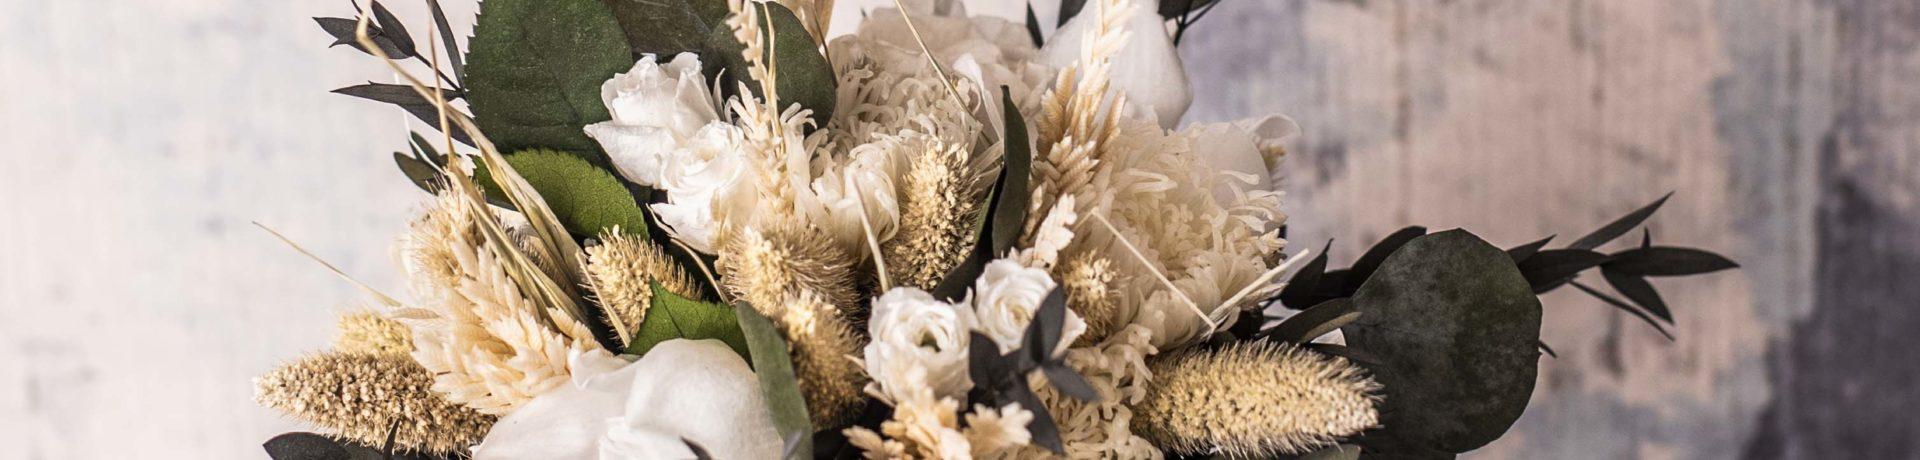 Ramo De Flores Preservado Seco Pequeno Blanco